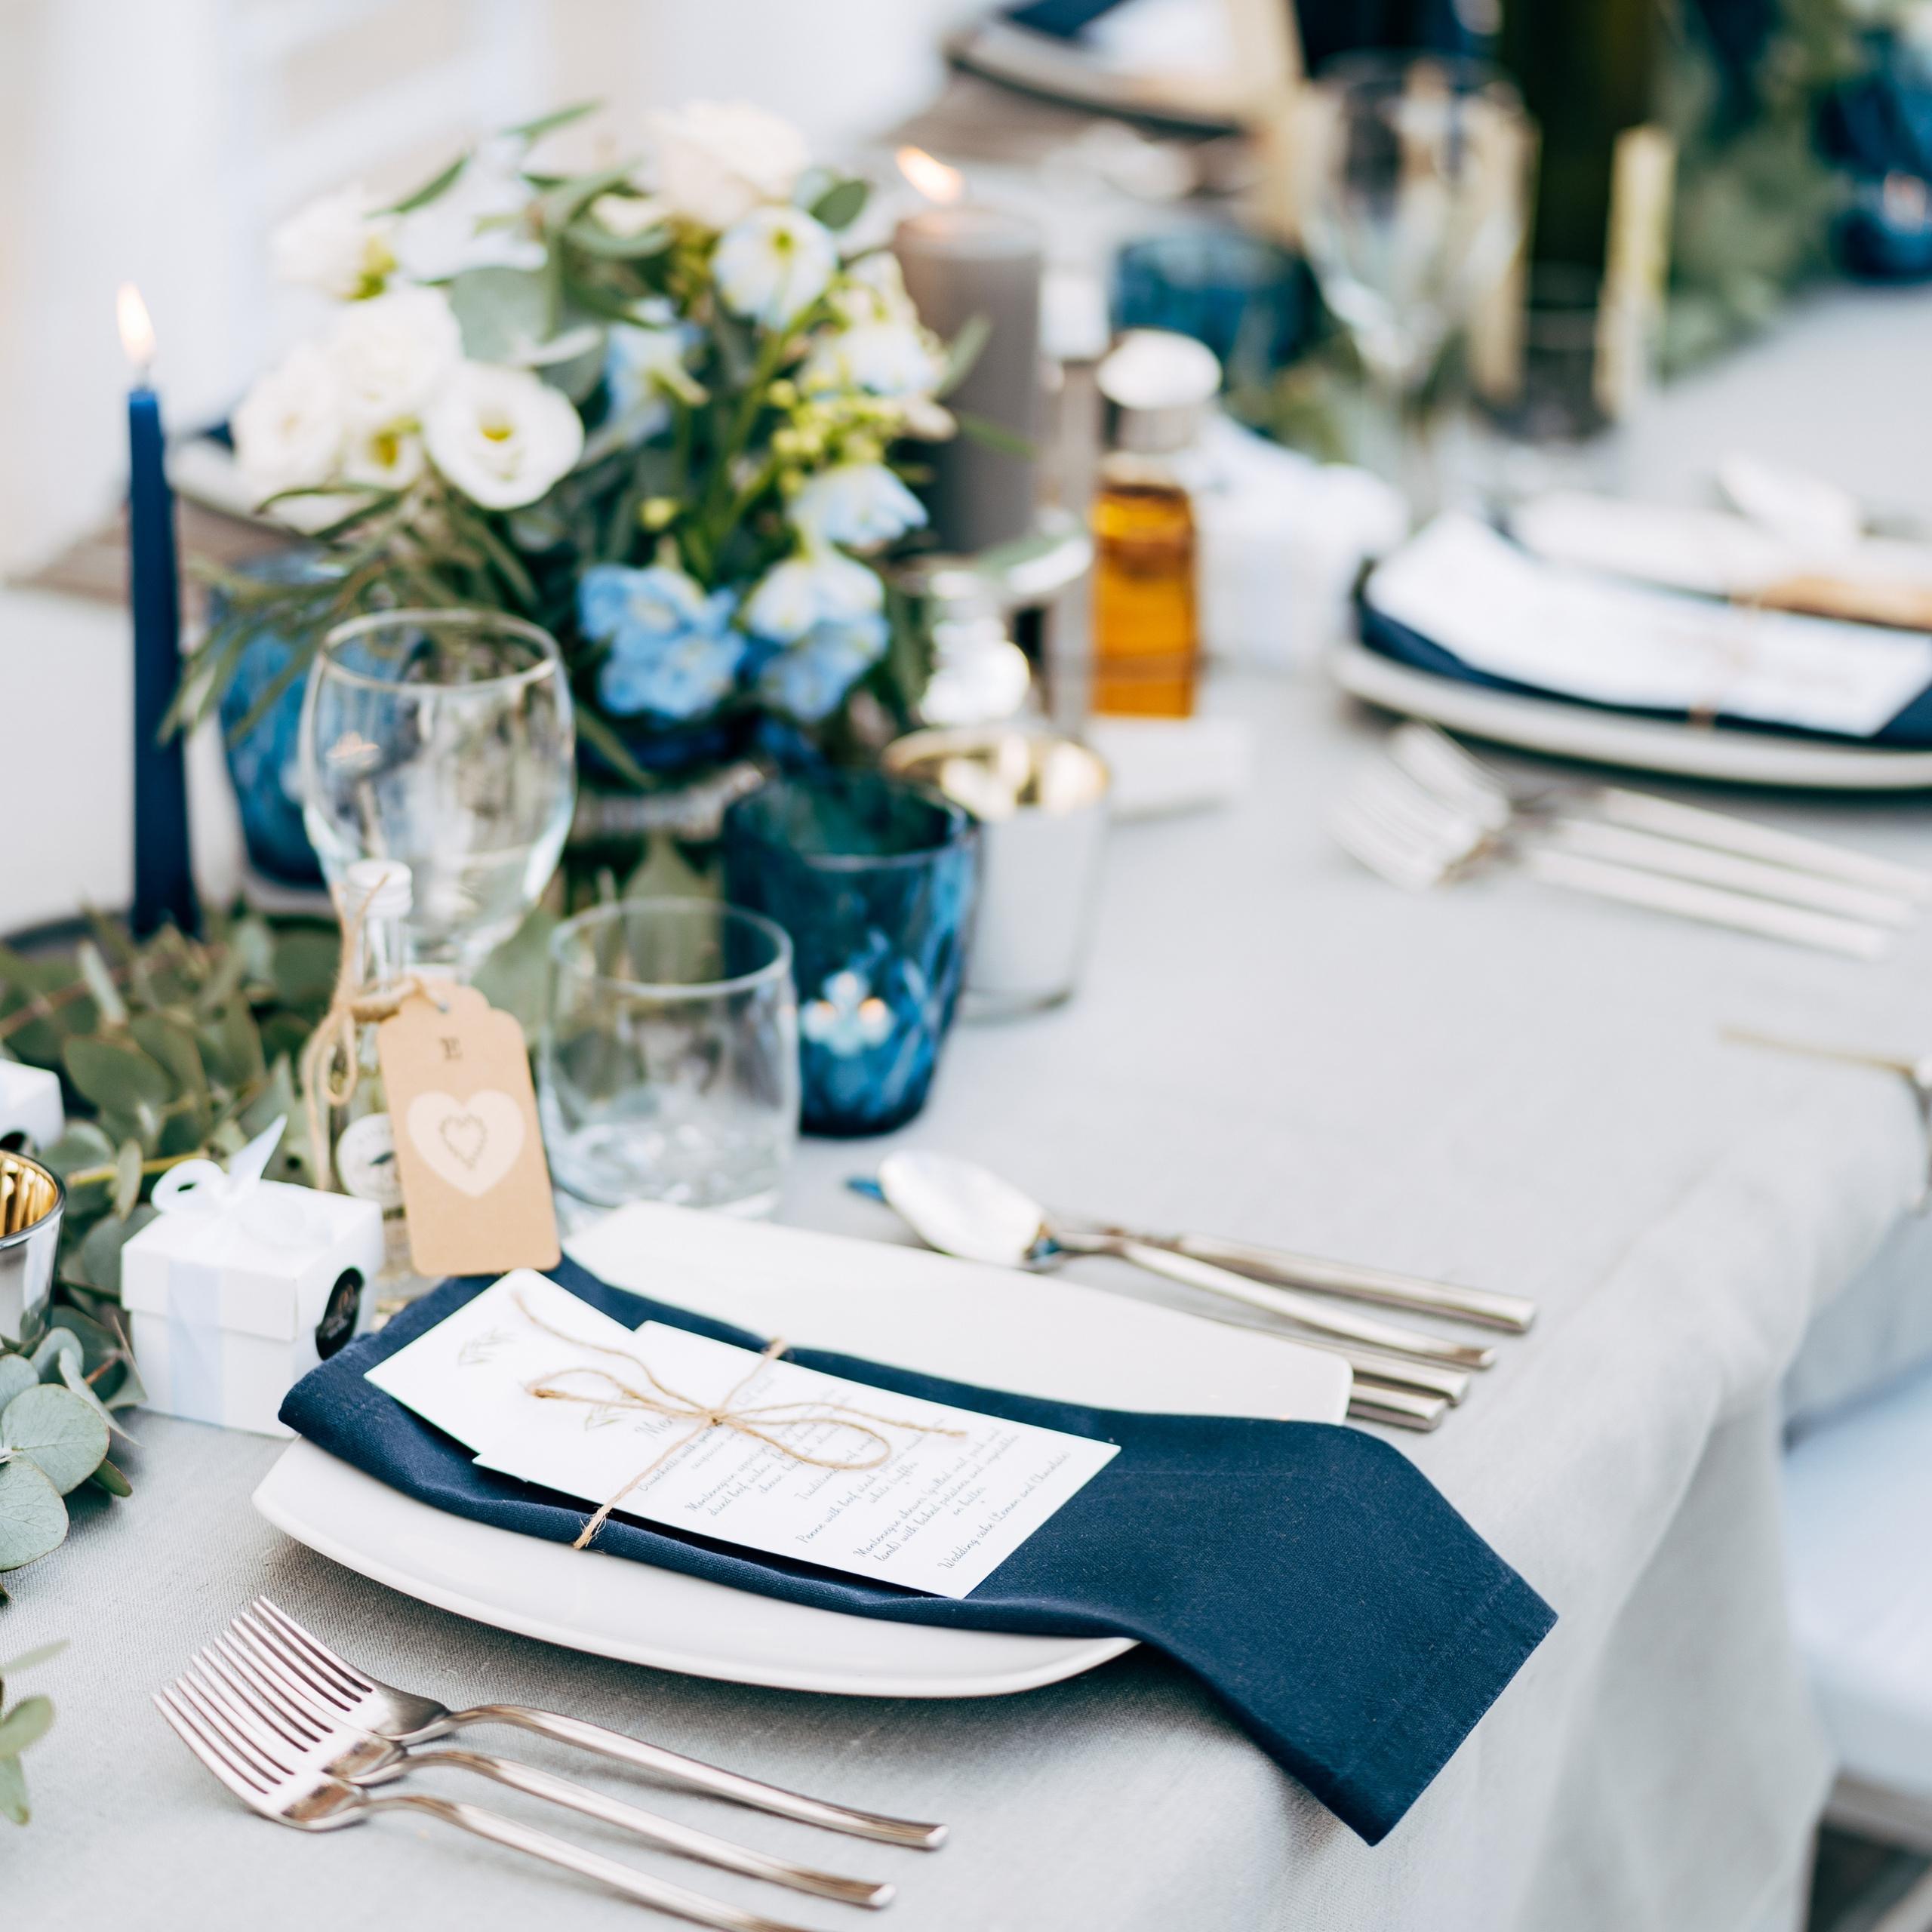 Weddings- Pristine Marketing & Events - Boise, Idaho & Key West, Florida Event Planner.